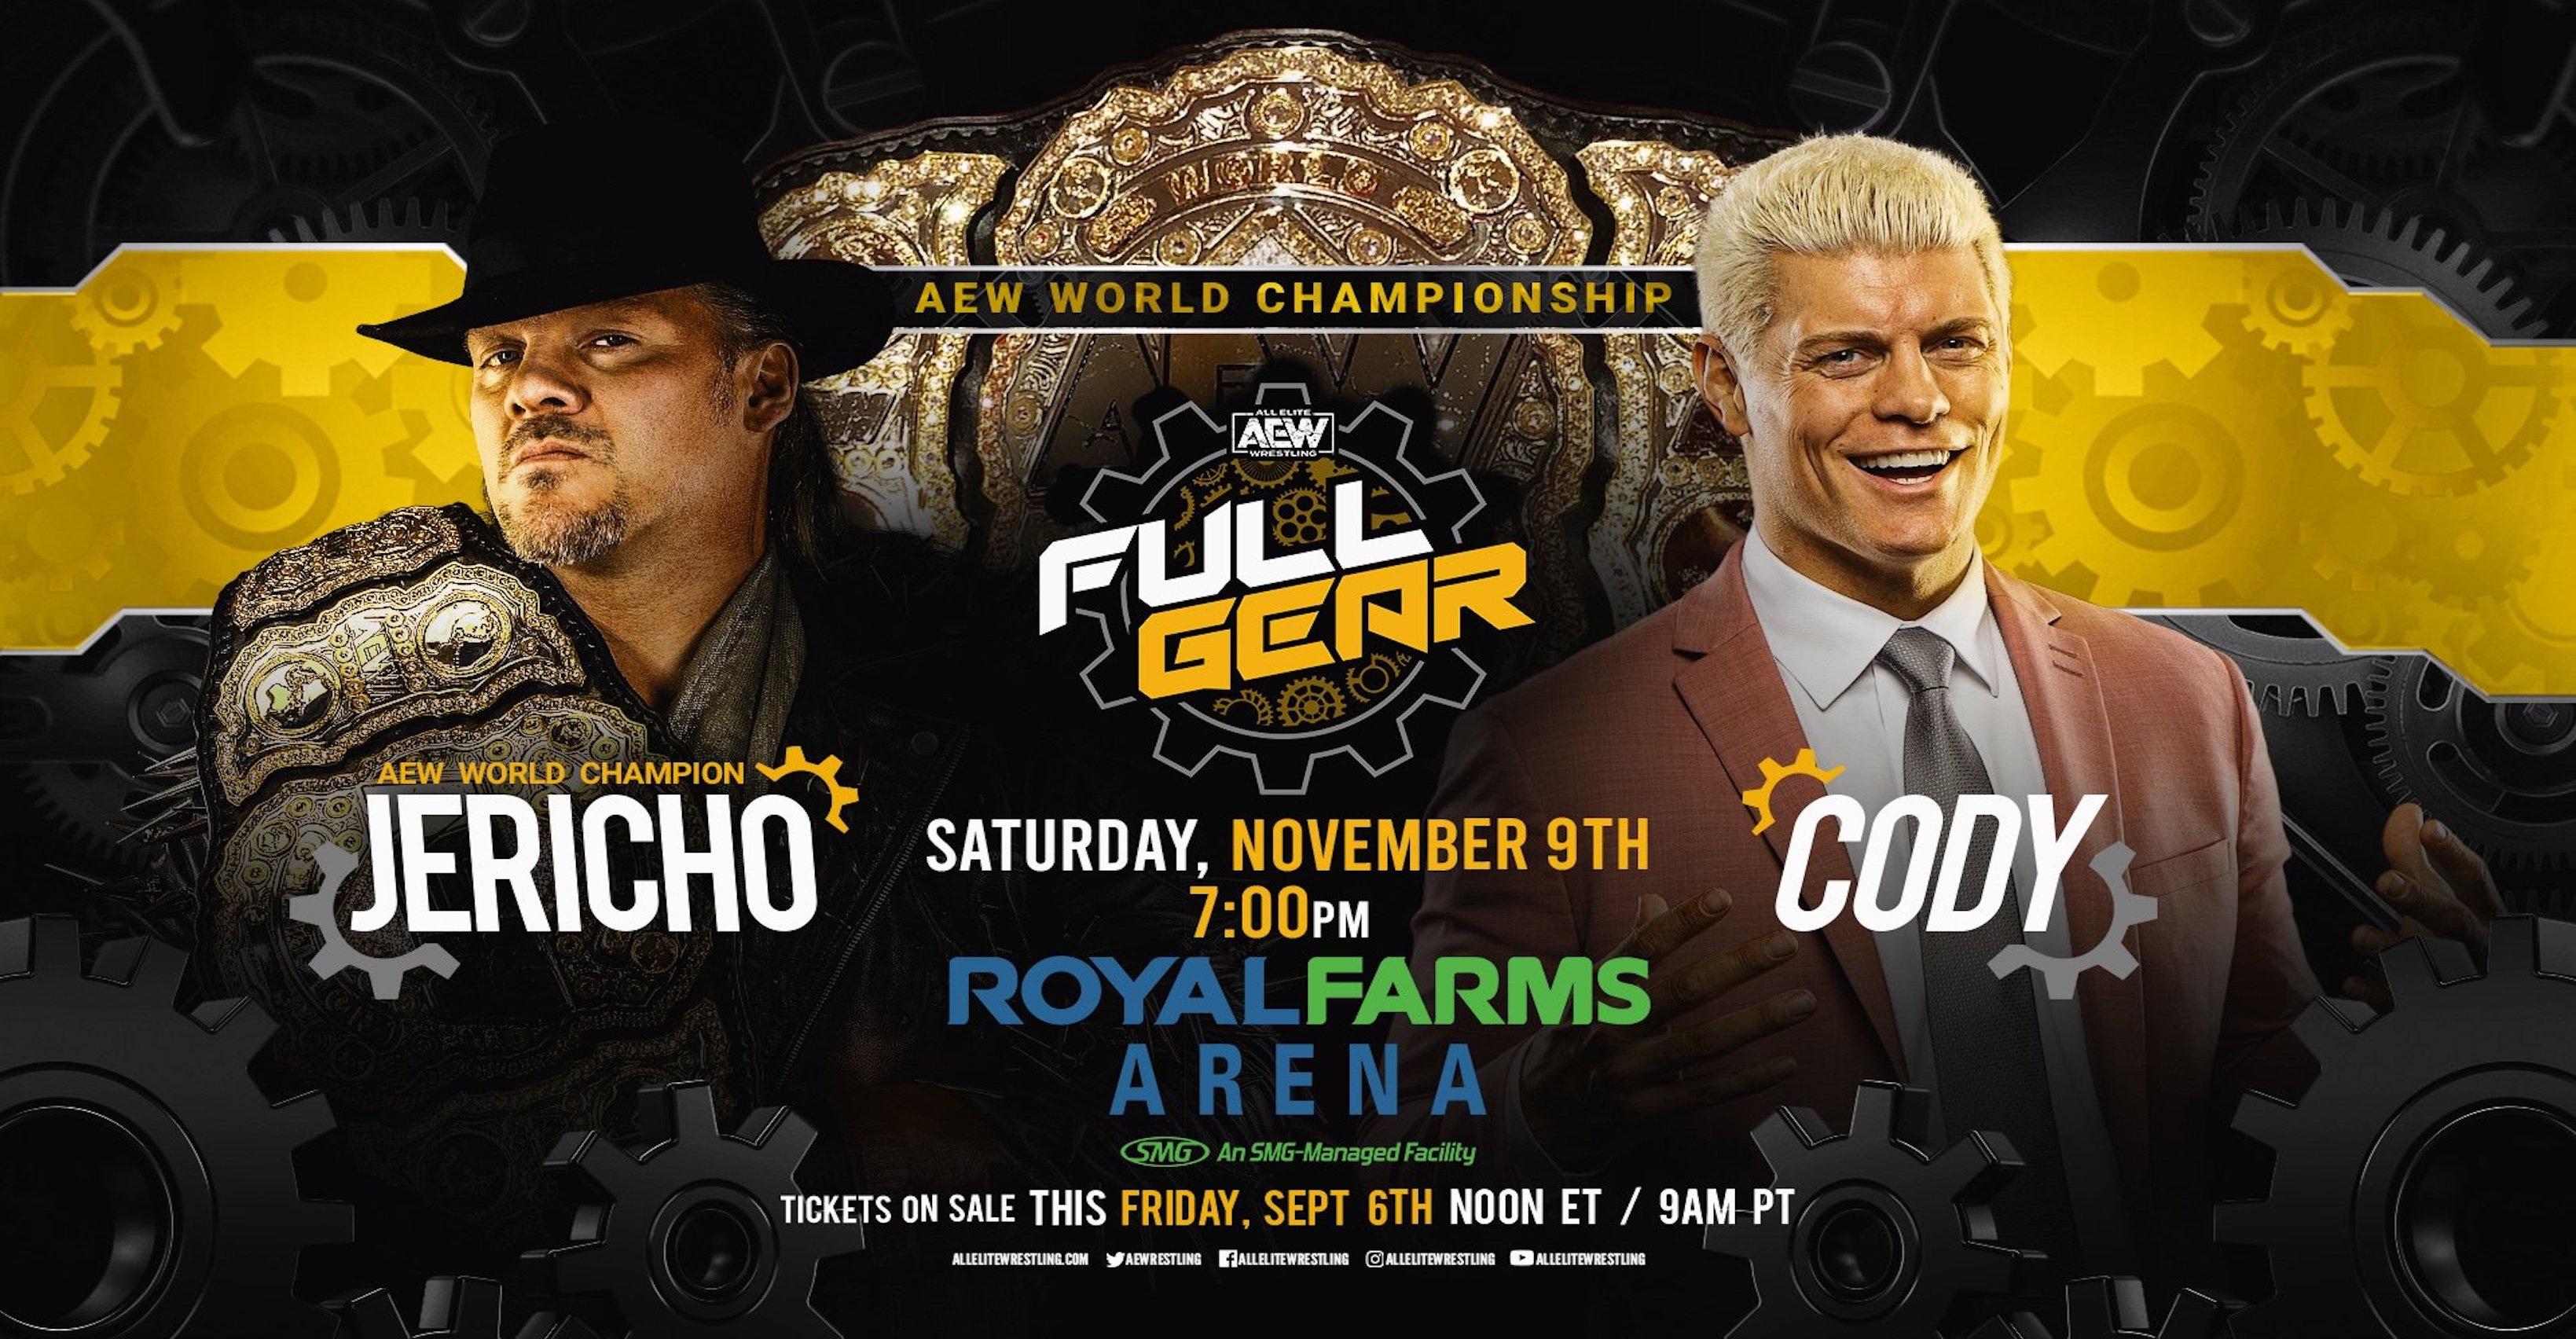 Chris Jericho Vs. Cody Rhodes World Title Match Set For AEW 'Full Gear'